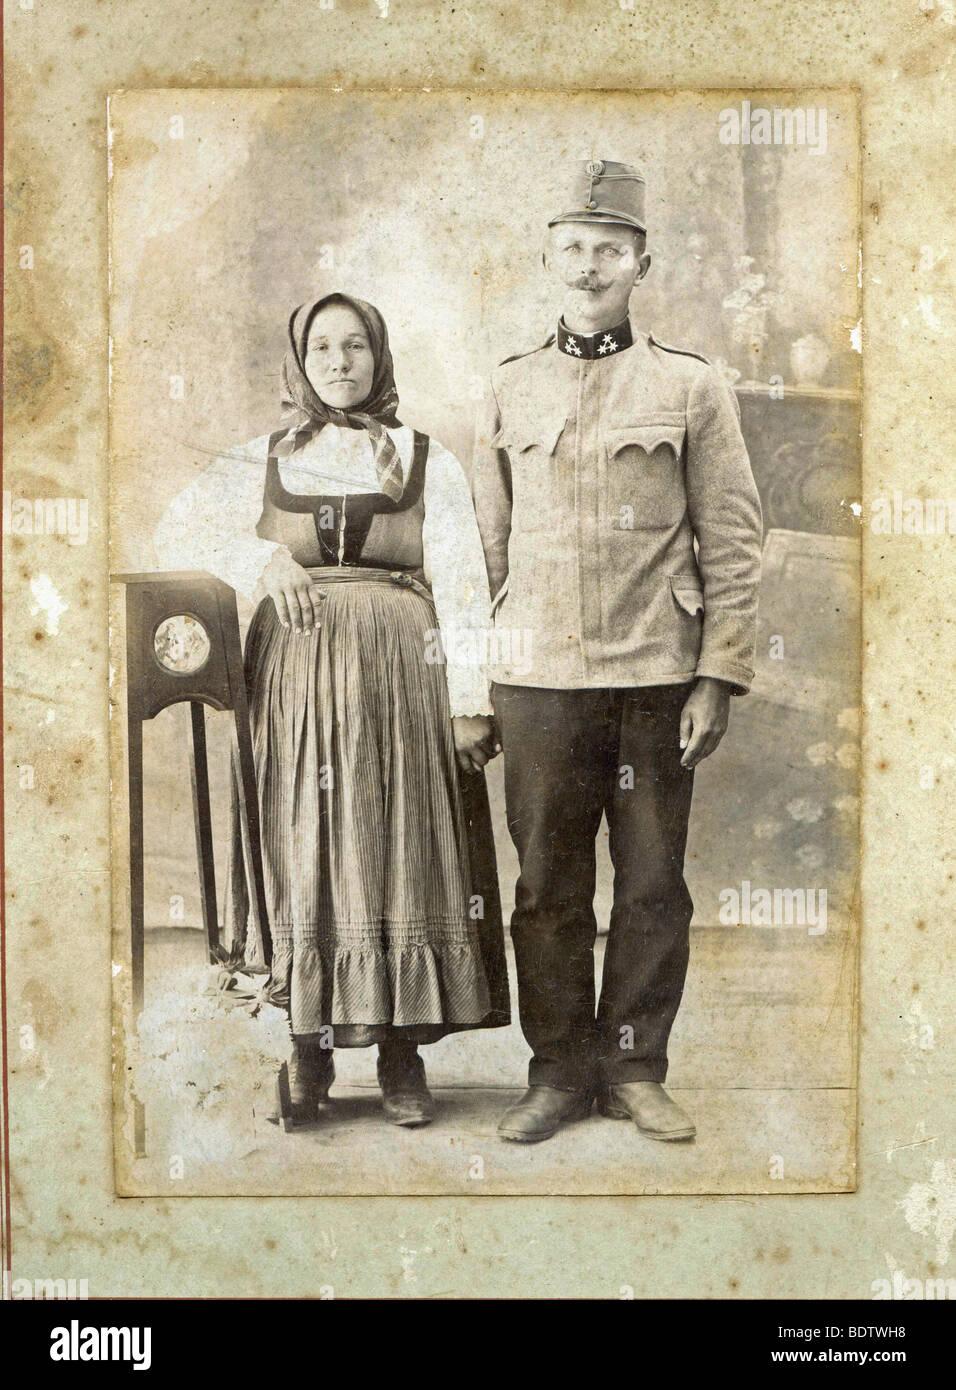 Couple, Transylvania, Romania, historical photo, 1920 Stock Photo